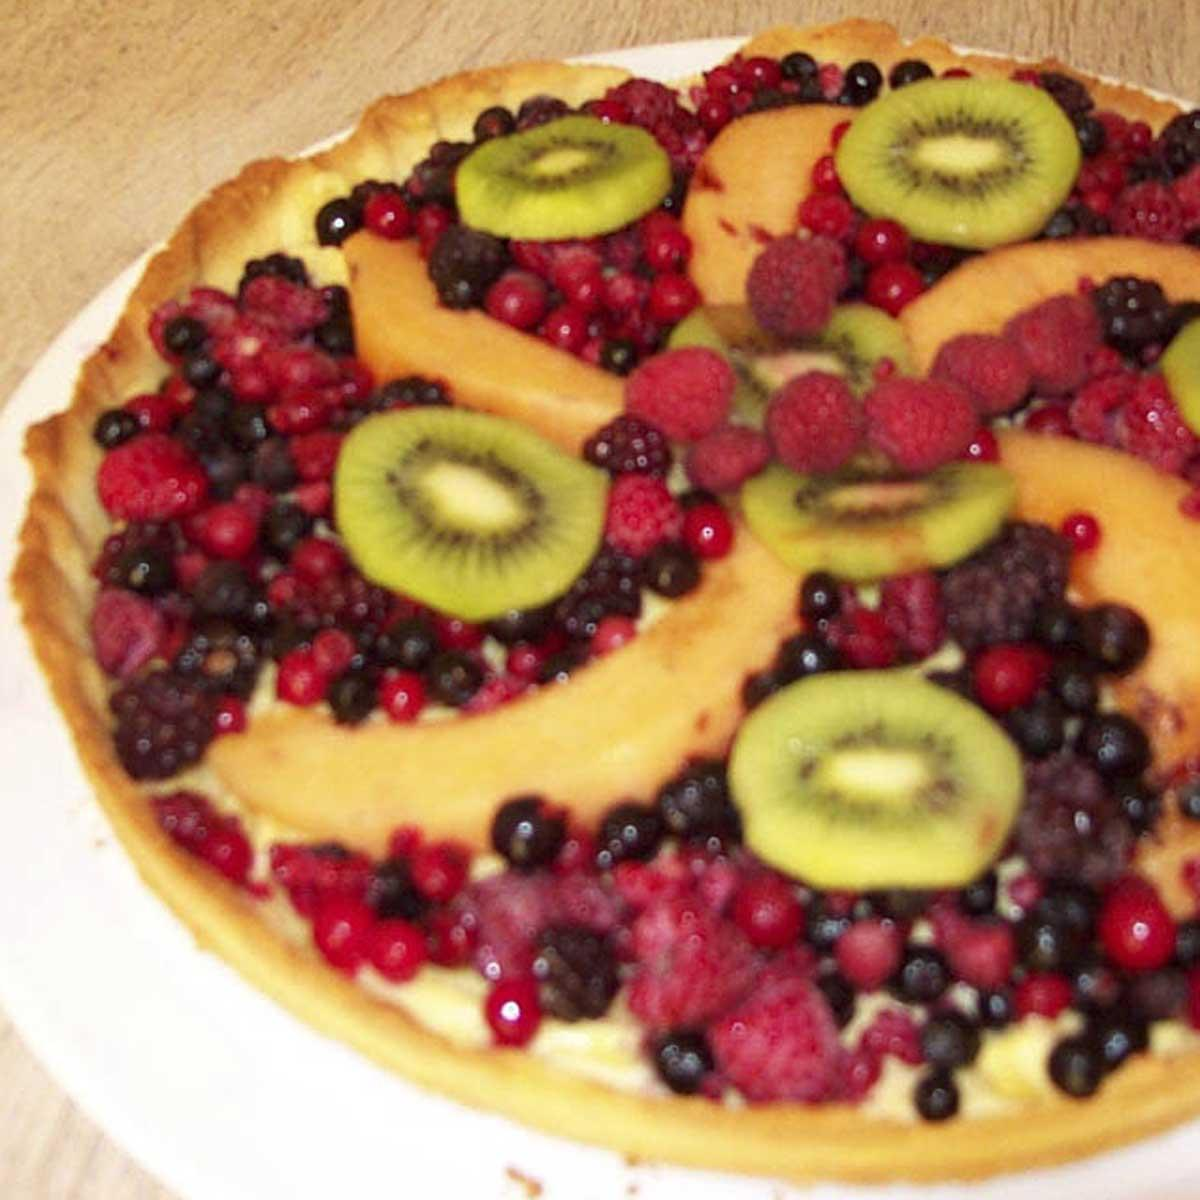 recette tarte aux fruits rouges et melon cuisine madame figaro. Black Bedroom Furniture Sets. Home Design Ideas